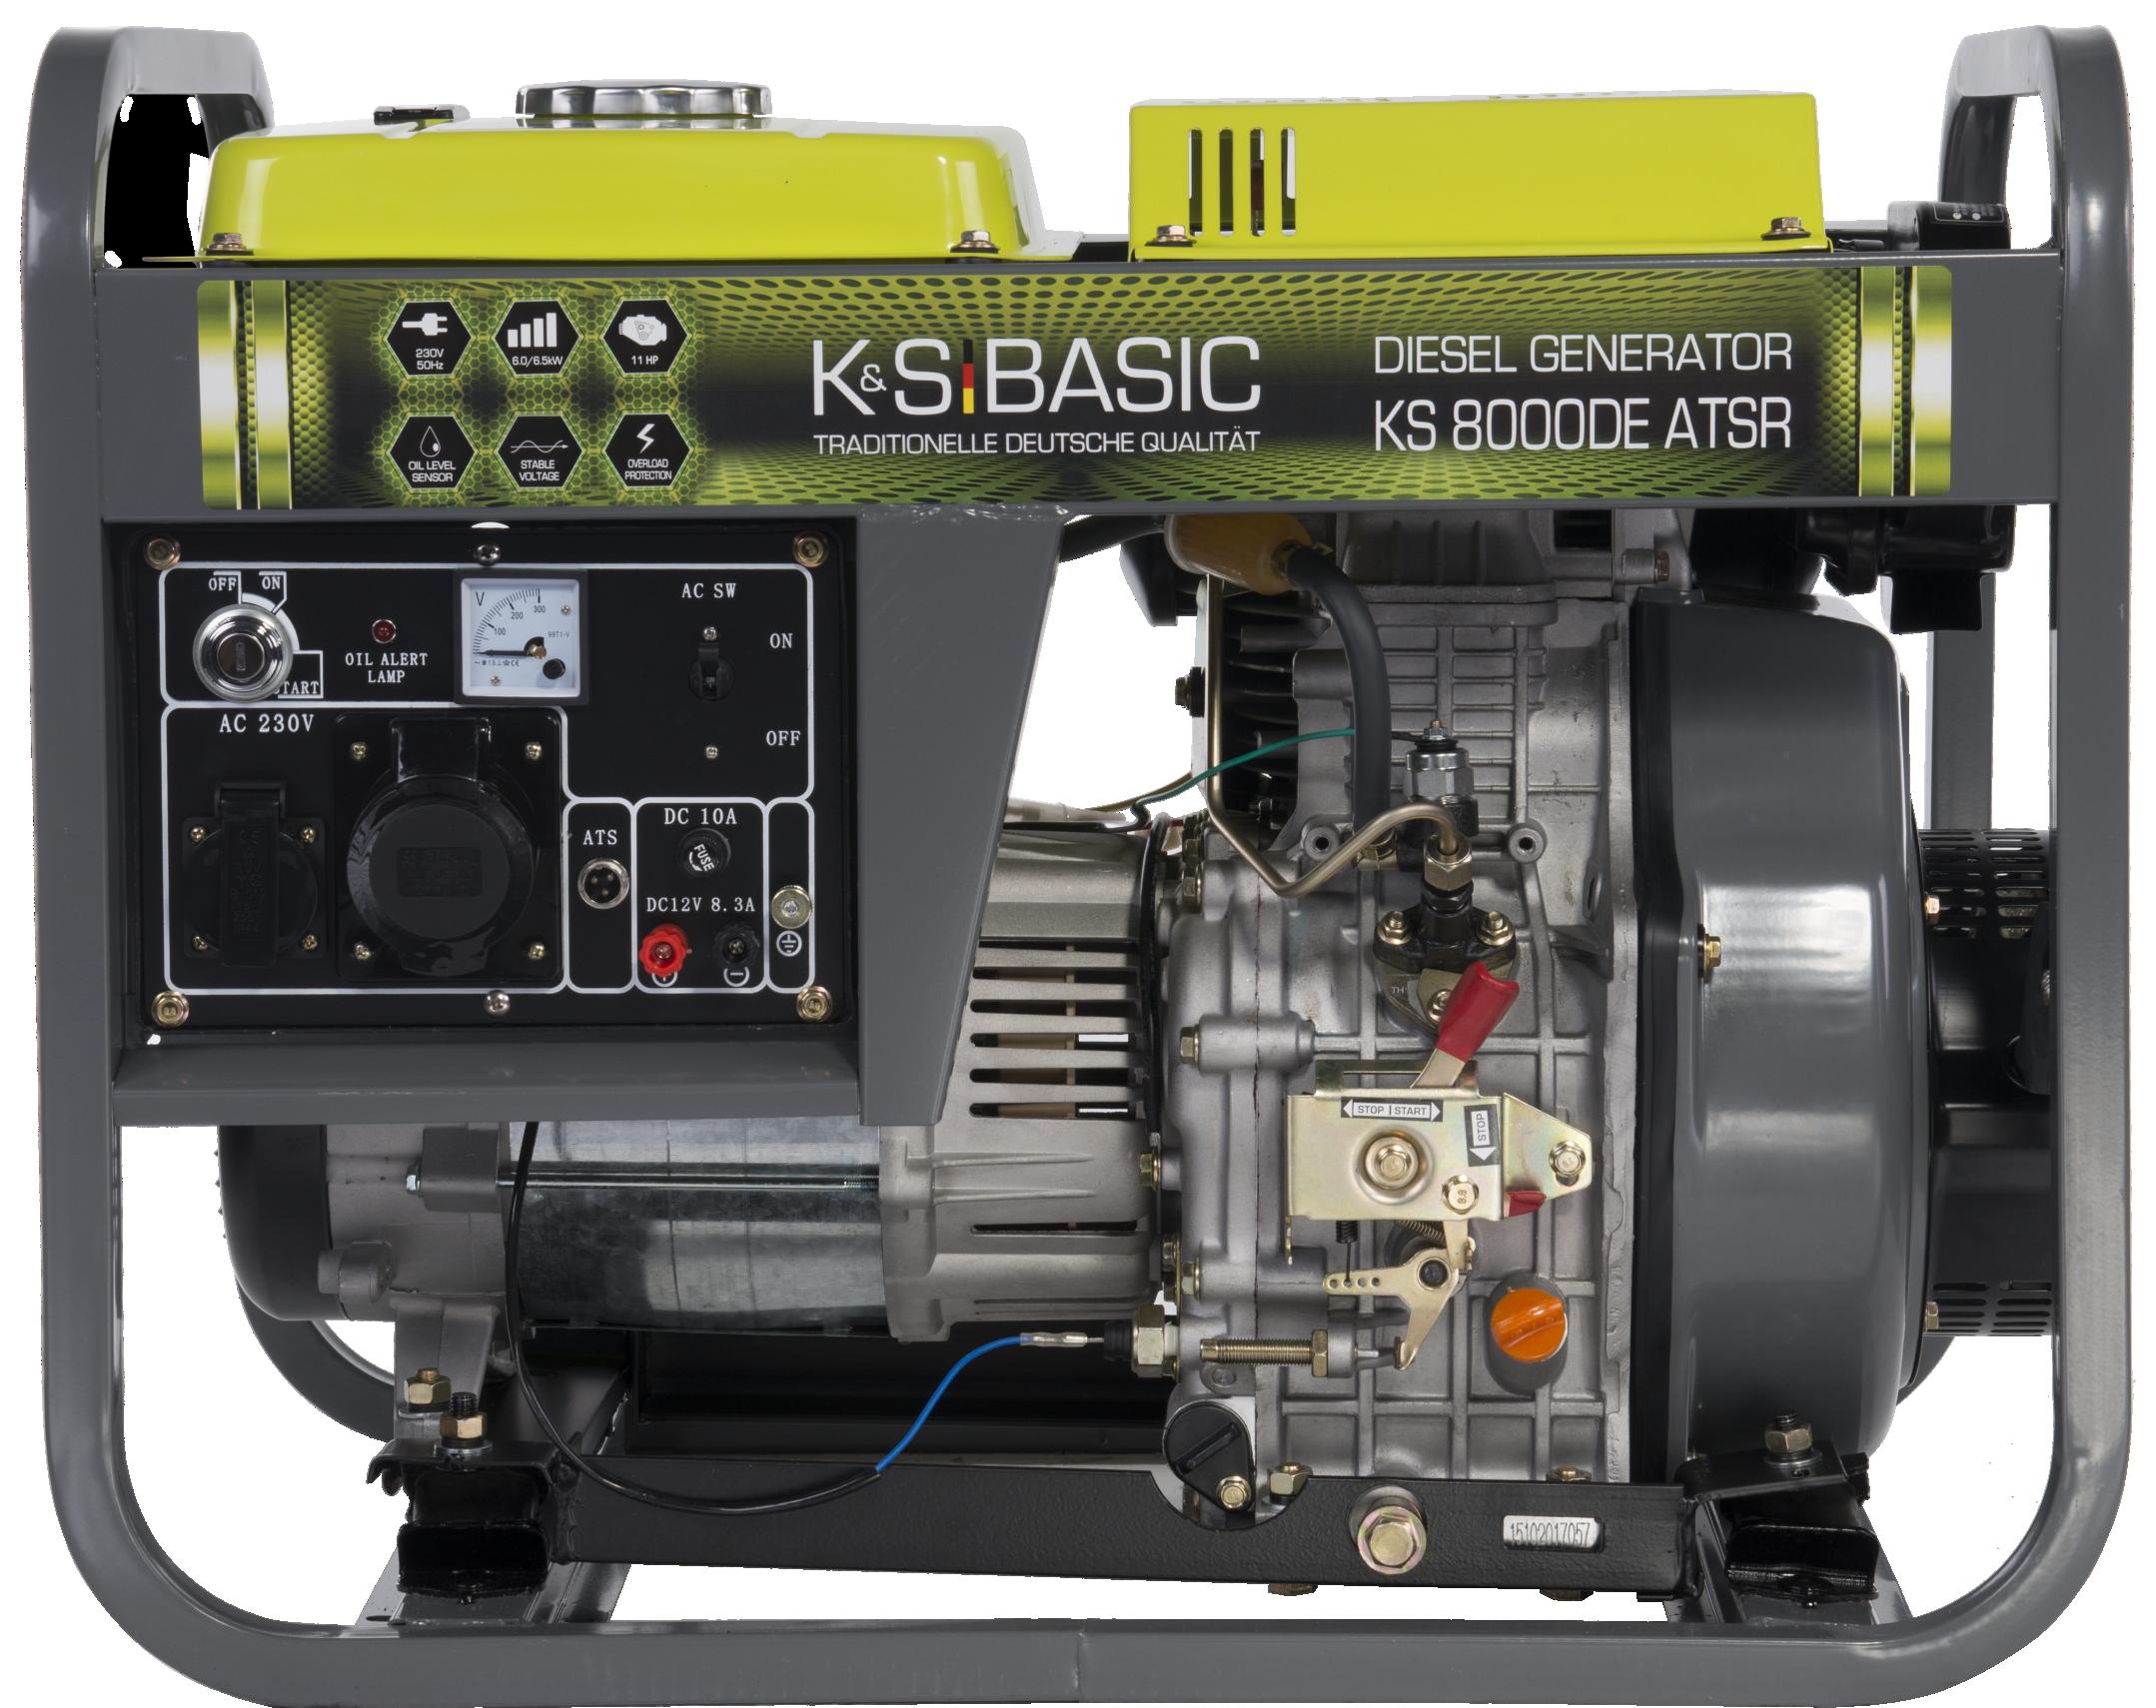 http://ks-power.com.ua/wp-content/uploads/2016/04/KS-8000DE-ATSR-12.png